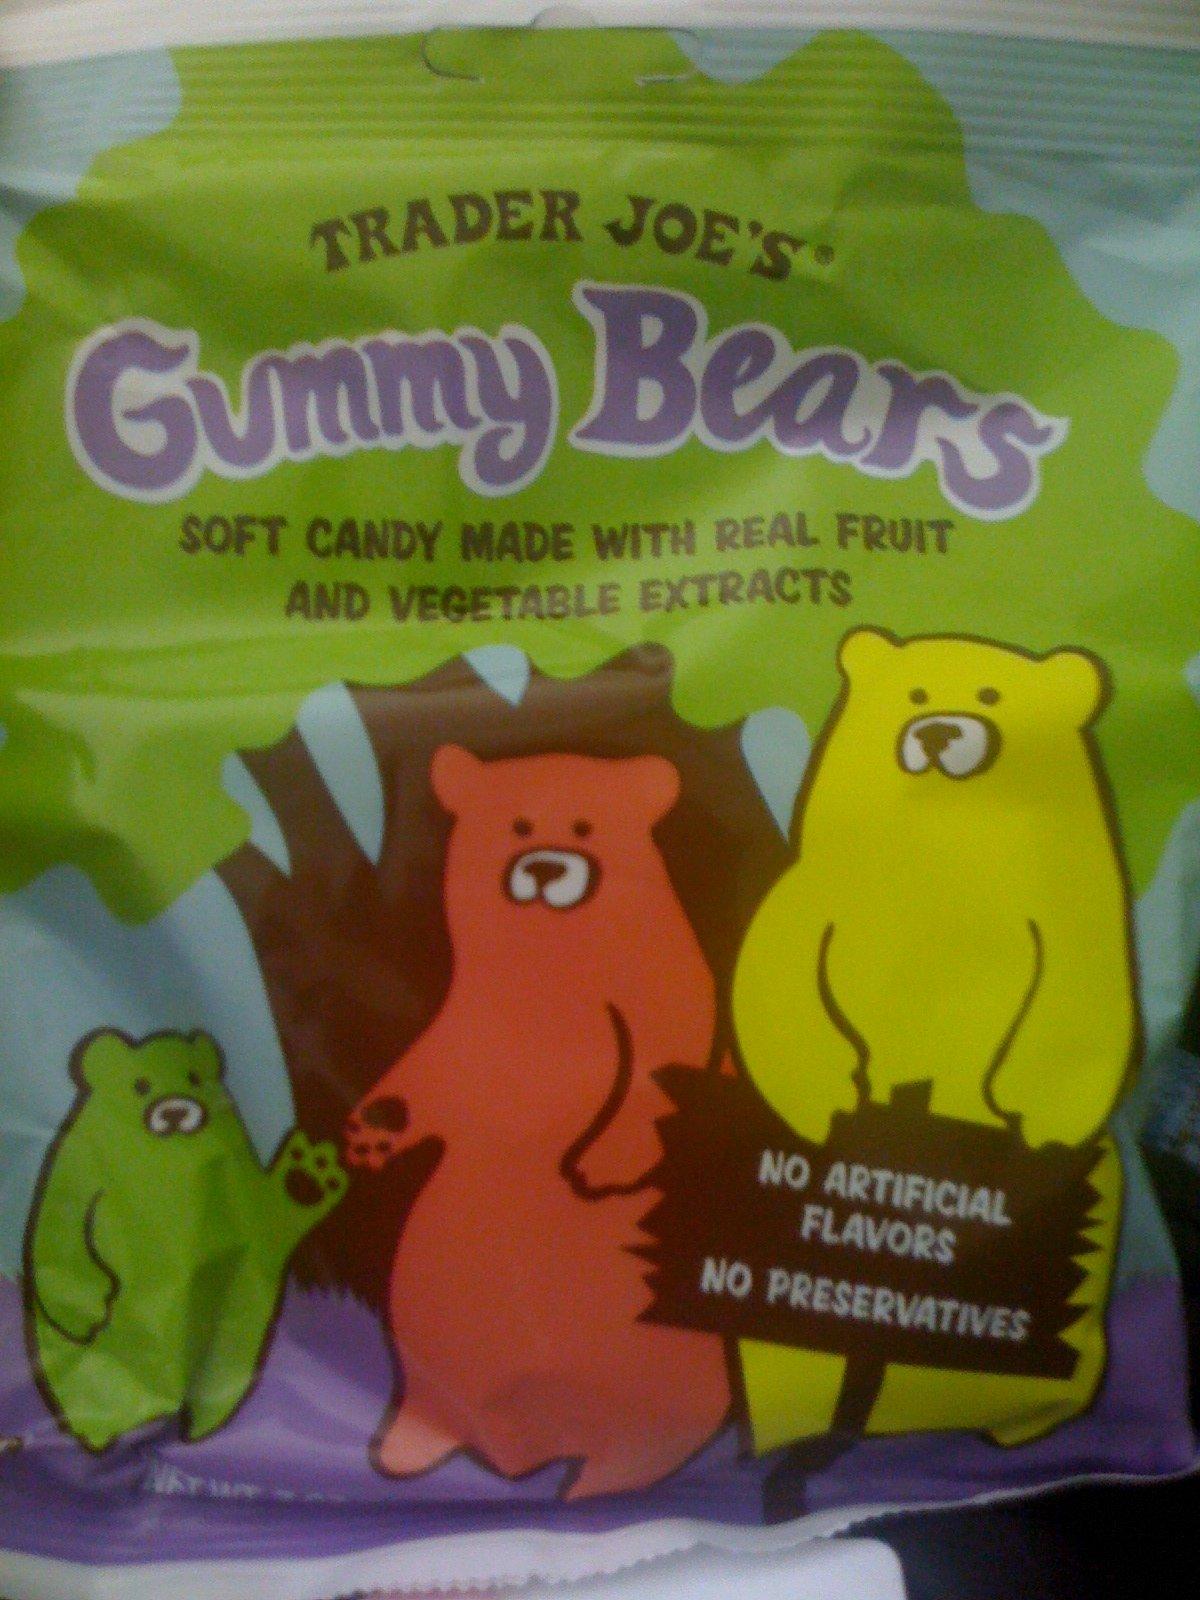 Trader Joe's Gummy Bears, Natural Real Fruit Candy, 7 Oz., (2 Pack)